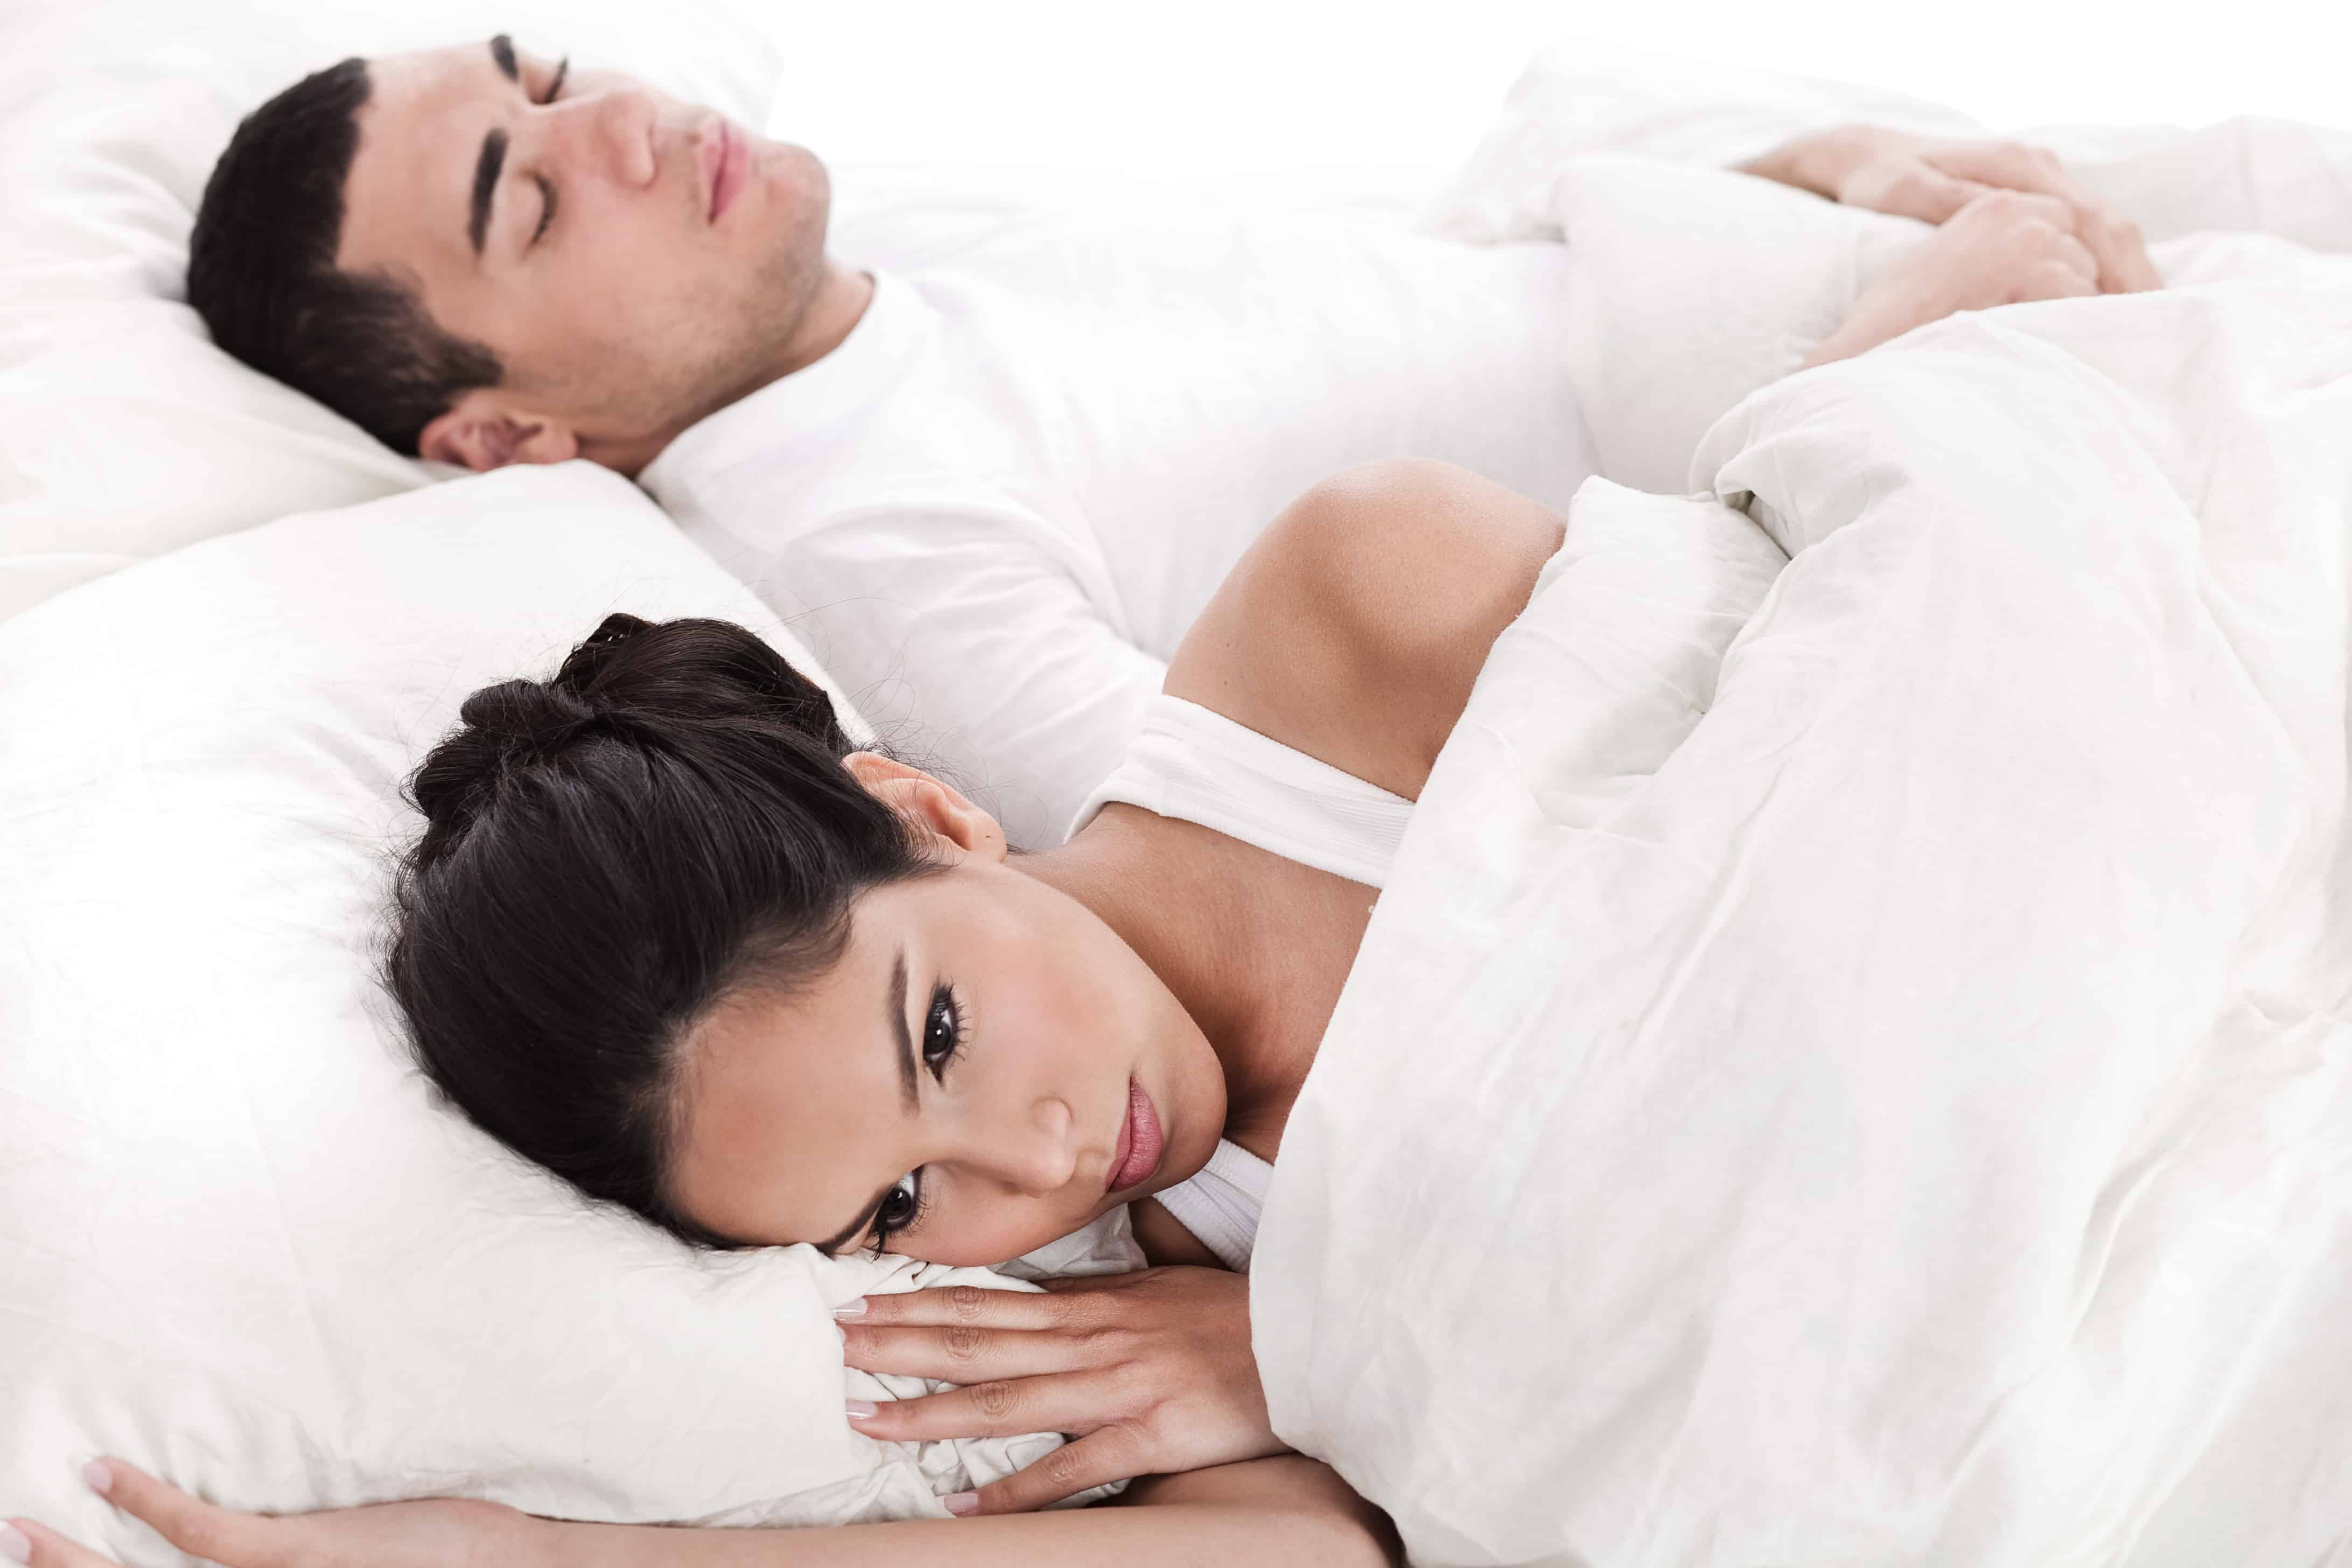 The Techy Tantrika: Sex + Love Wisdom - When Men Turn You Off